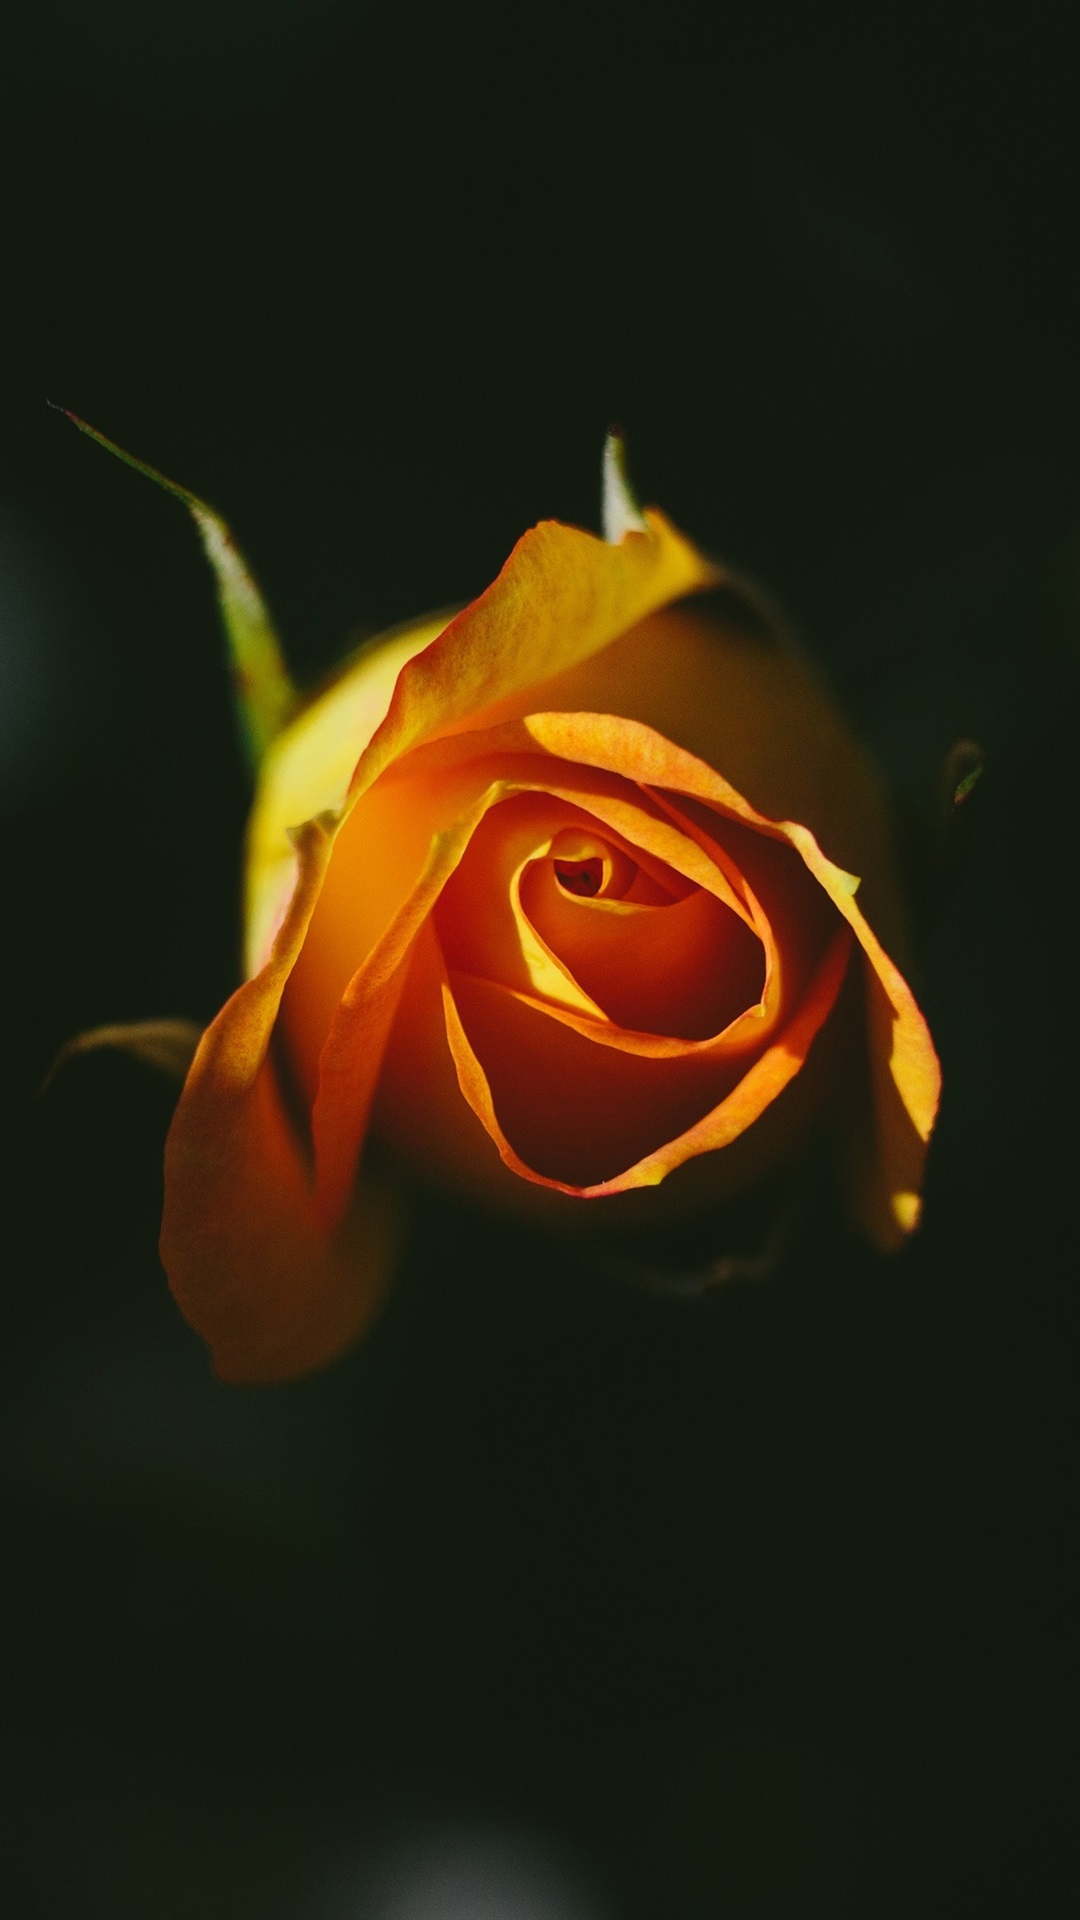 Orange Rose Black Background 1080x1920 Iphone 8 7 6 6s Plus Wallpaper Background Picture Image